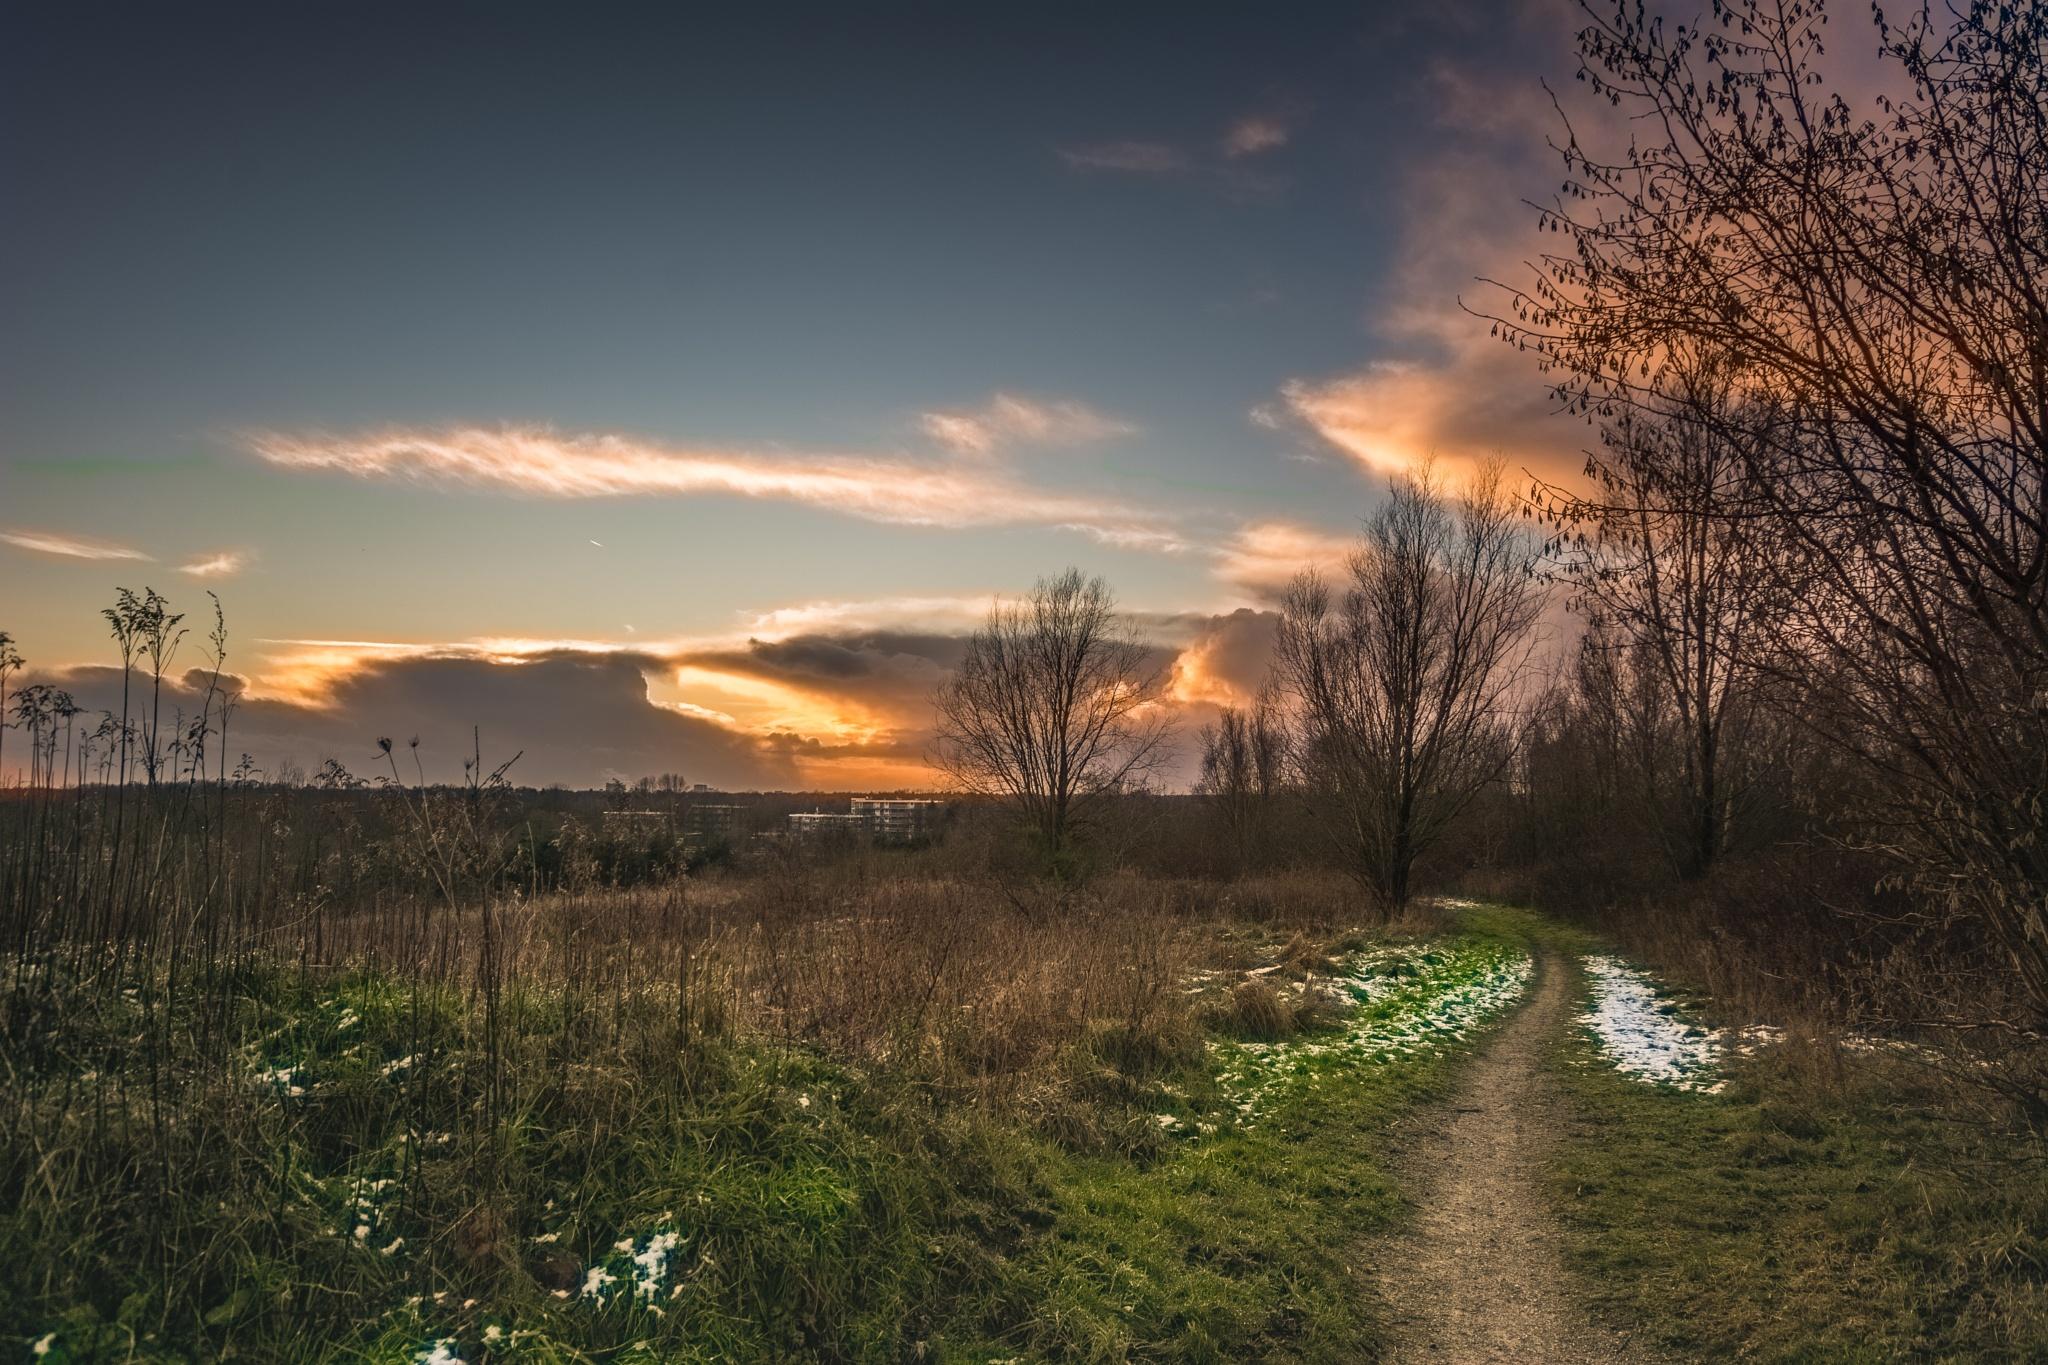 Sunset, Emmen 16-01 by TaraKiekt.nl